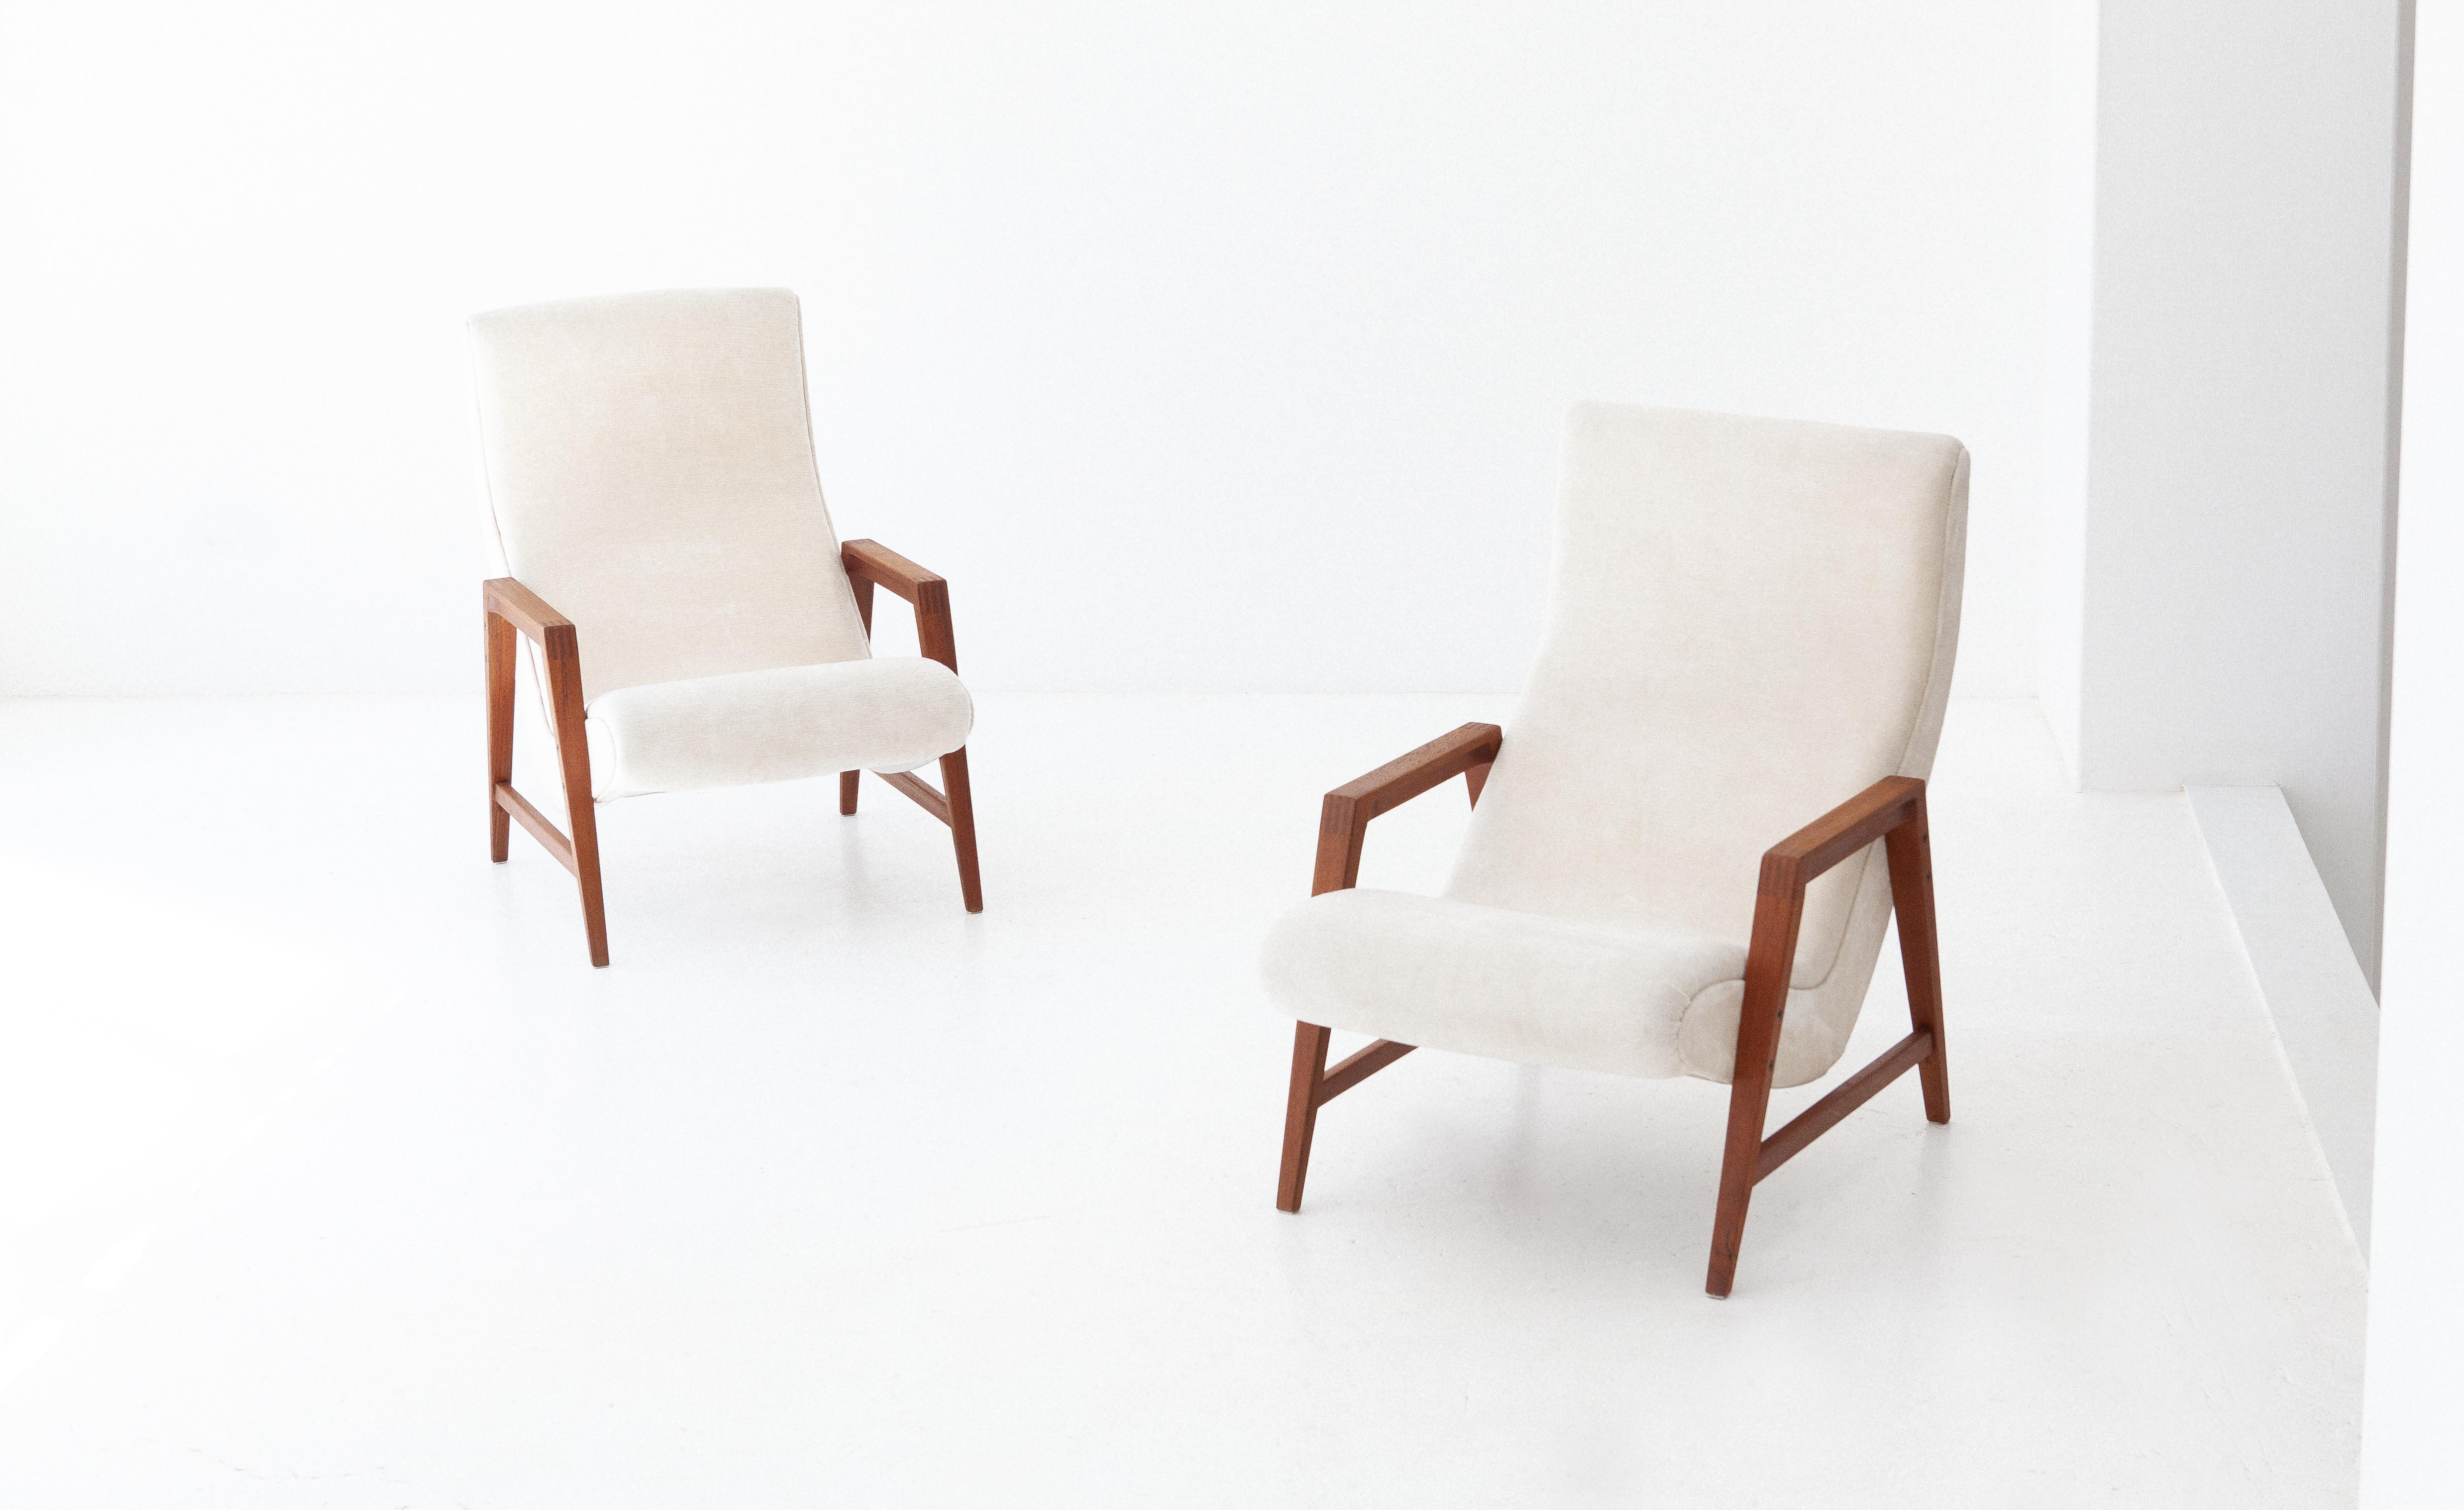 1950s-italian-teak-beige-velvet-lounge-armchairs-1-se285